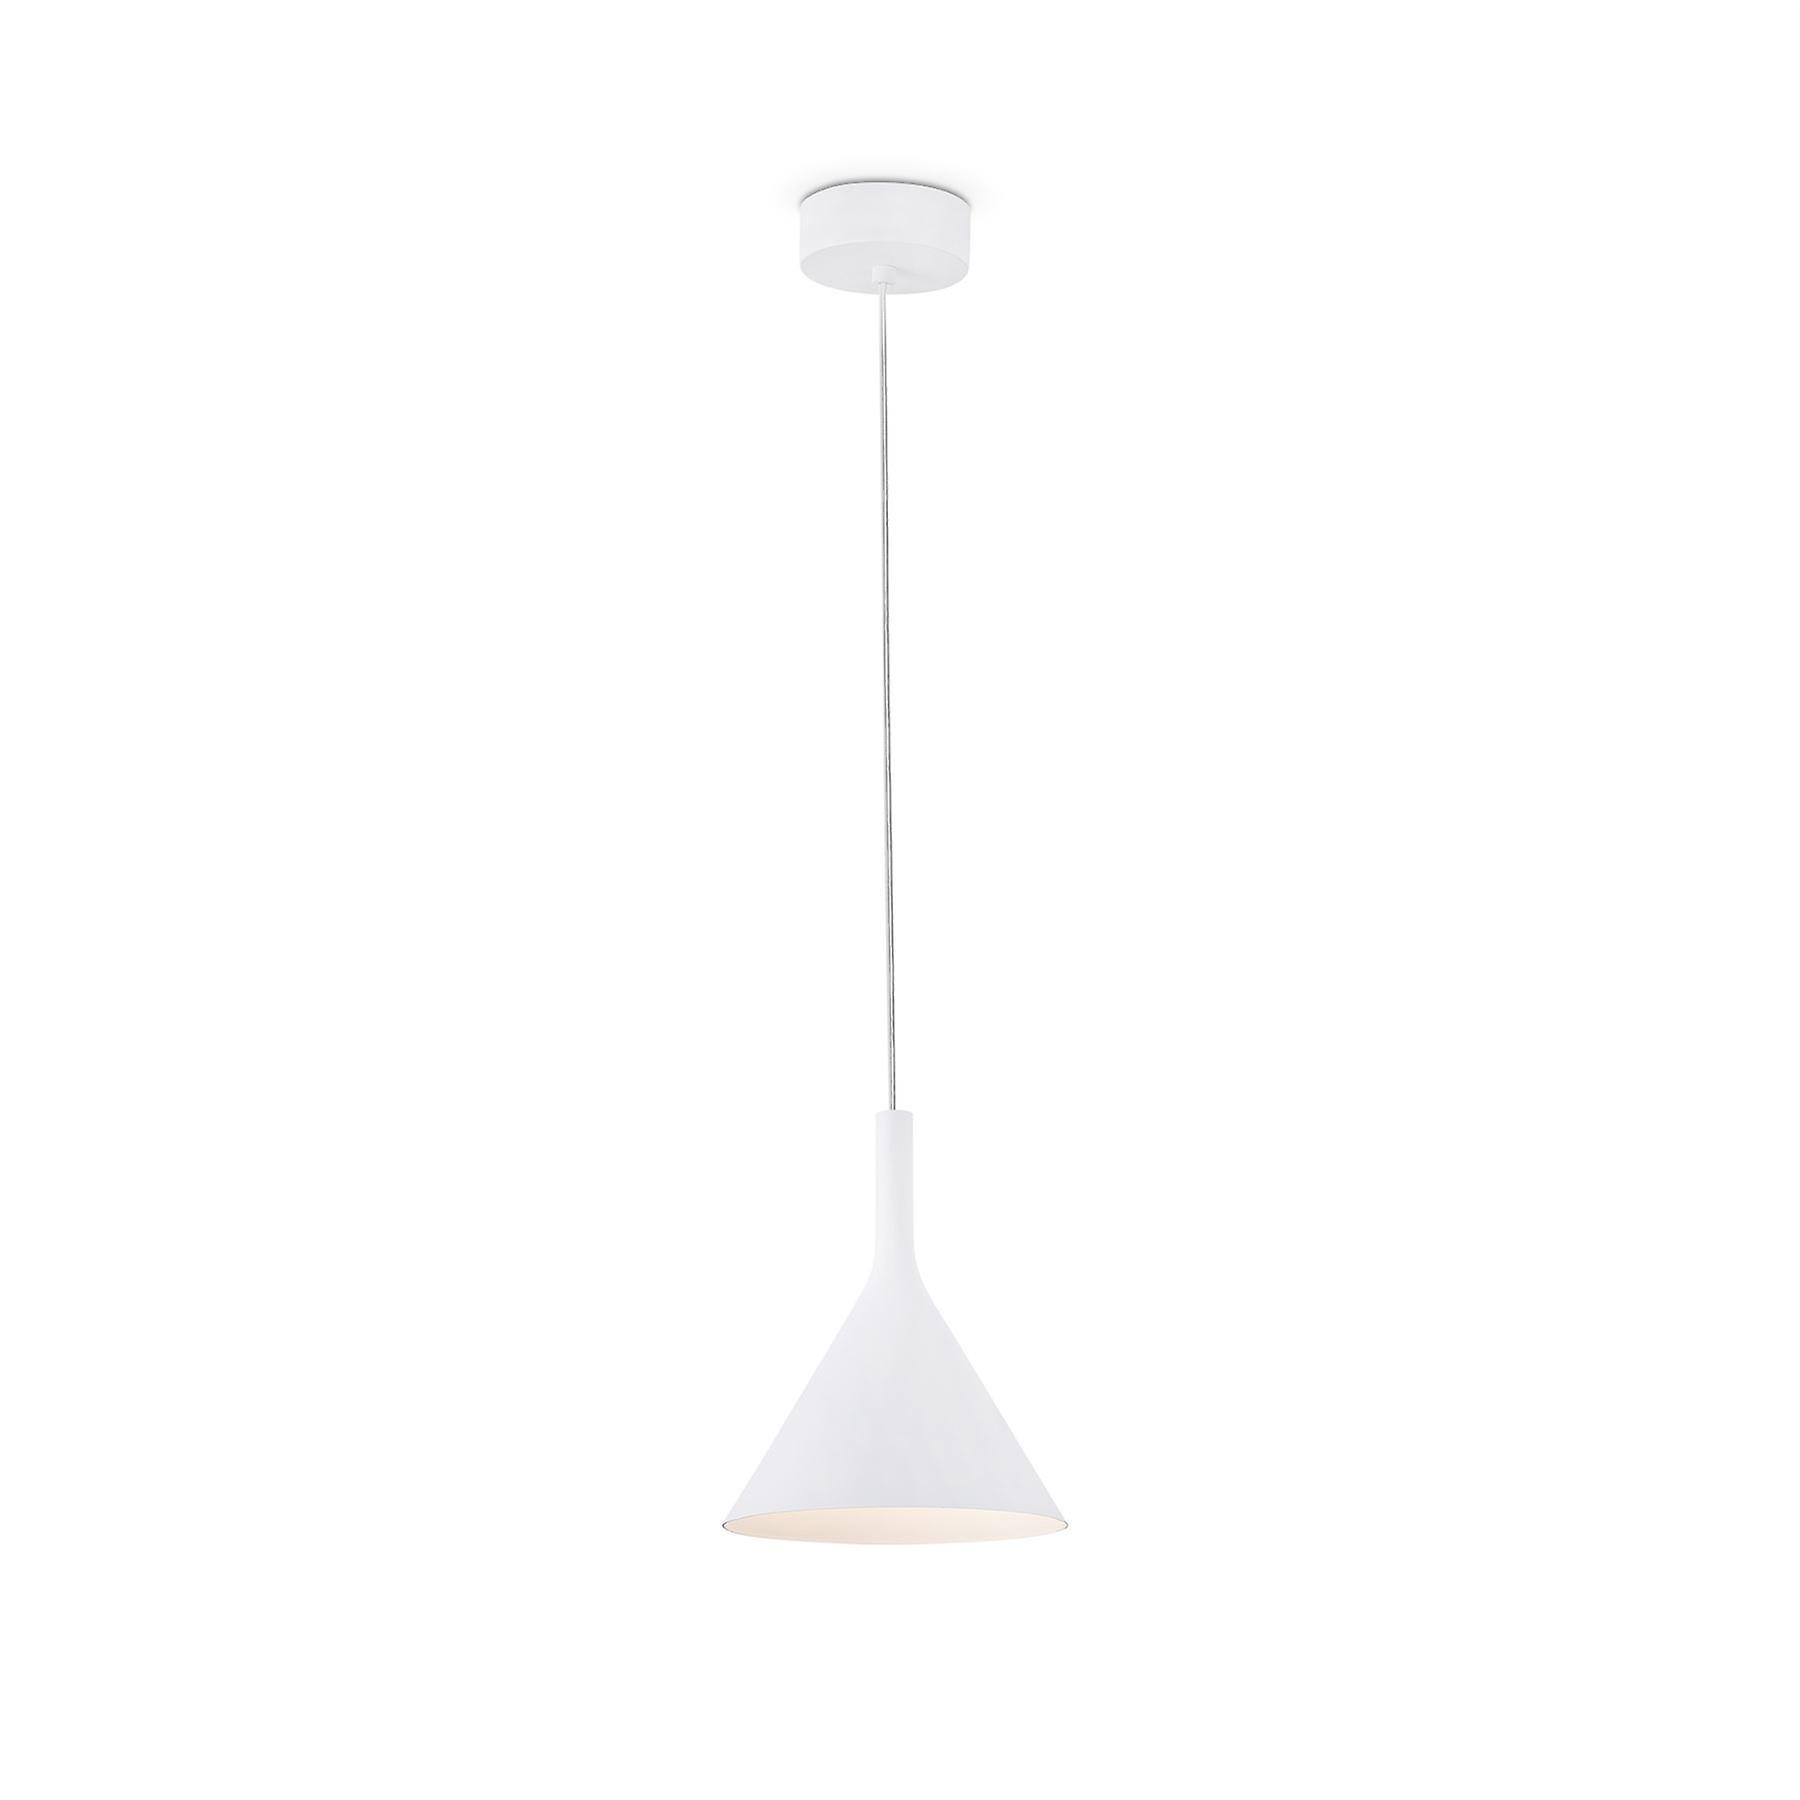 Faro - Pam petit blanc LED pendentif FARO64159